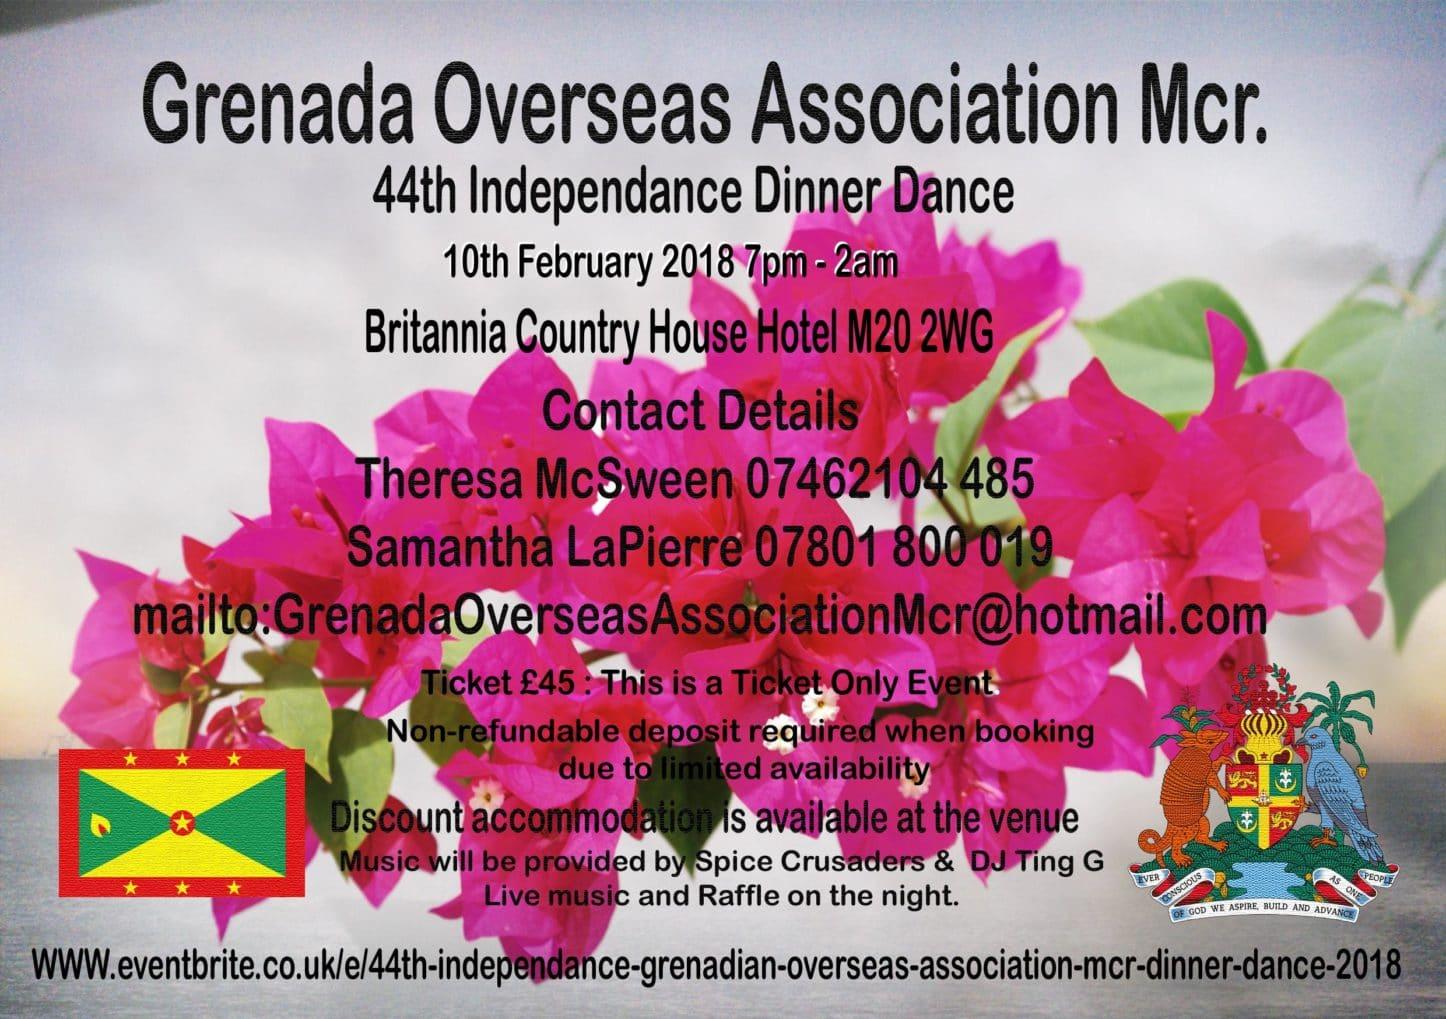 44th Independence Grenadian Overseas Association Mcr Dinner Dance 2018 | Blacknet UK